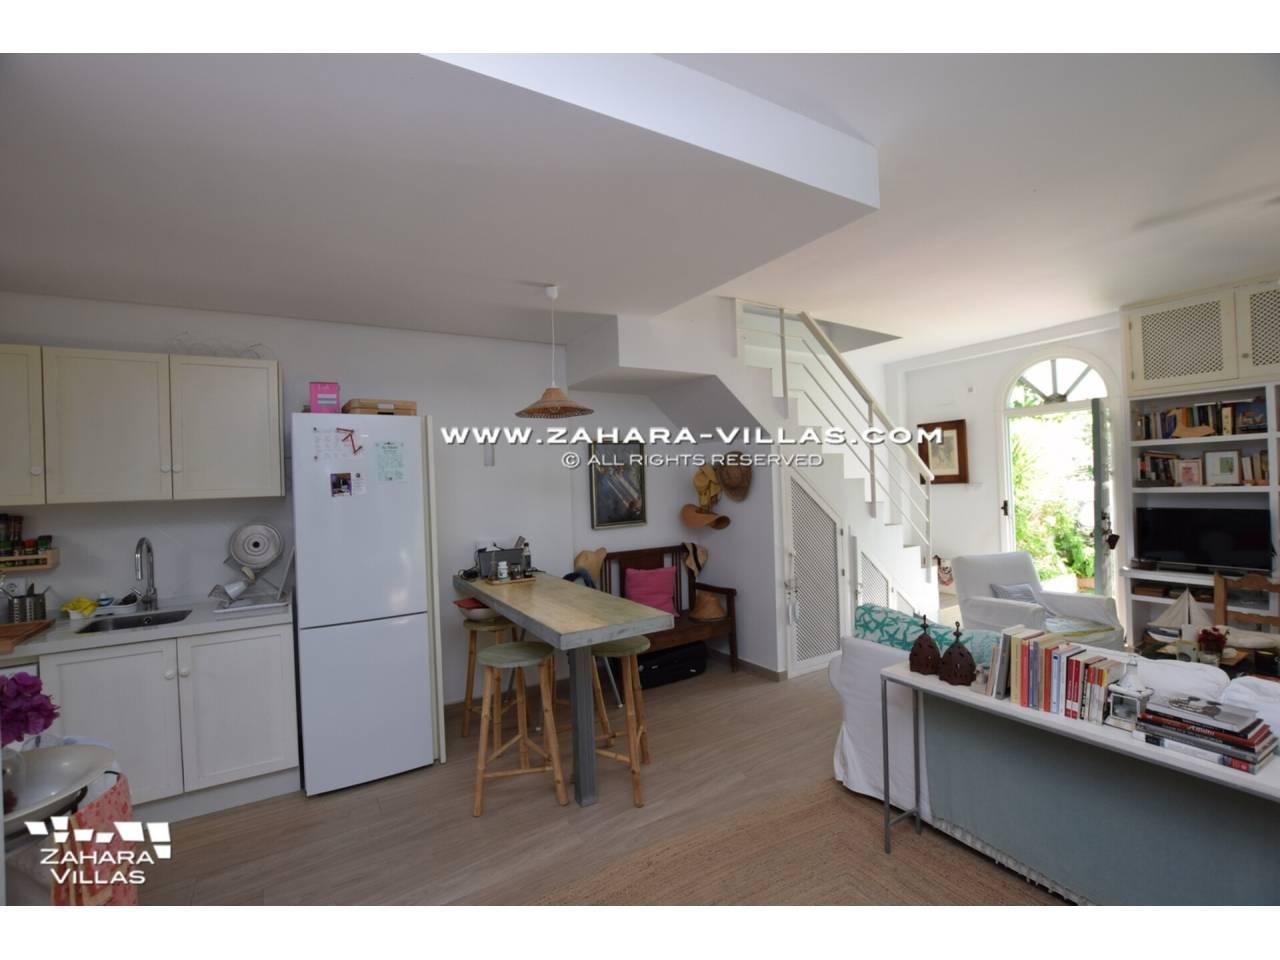 Imagen 5 de House for sale close to the beach, with sea views in Zahara de los Atunes